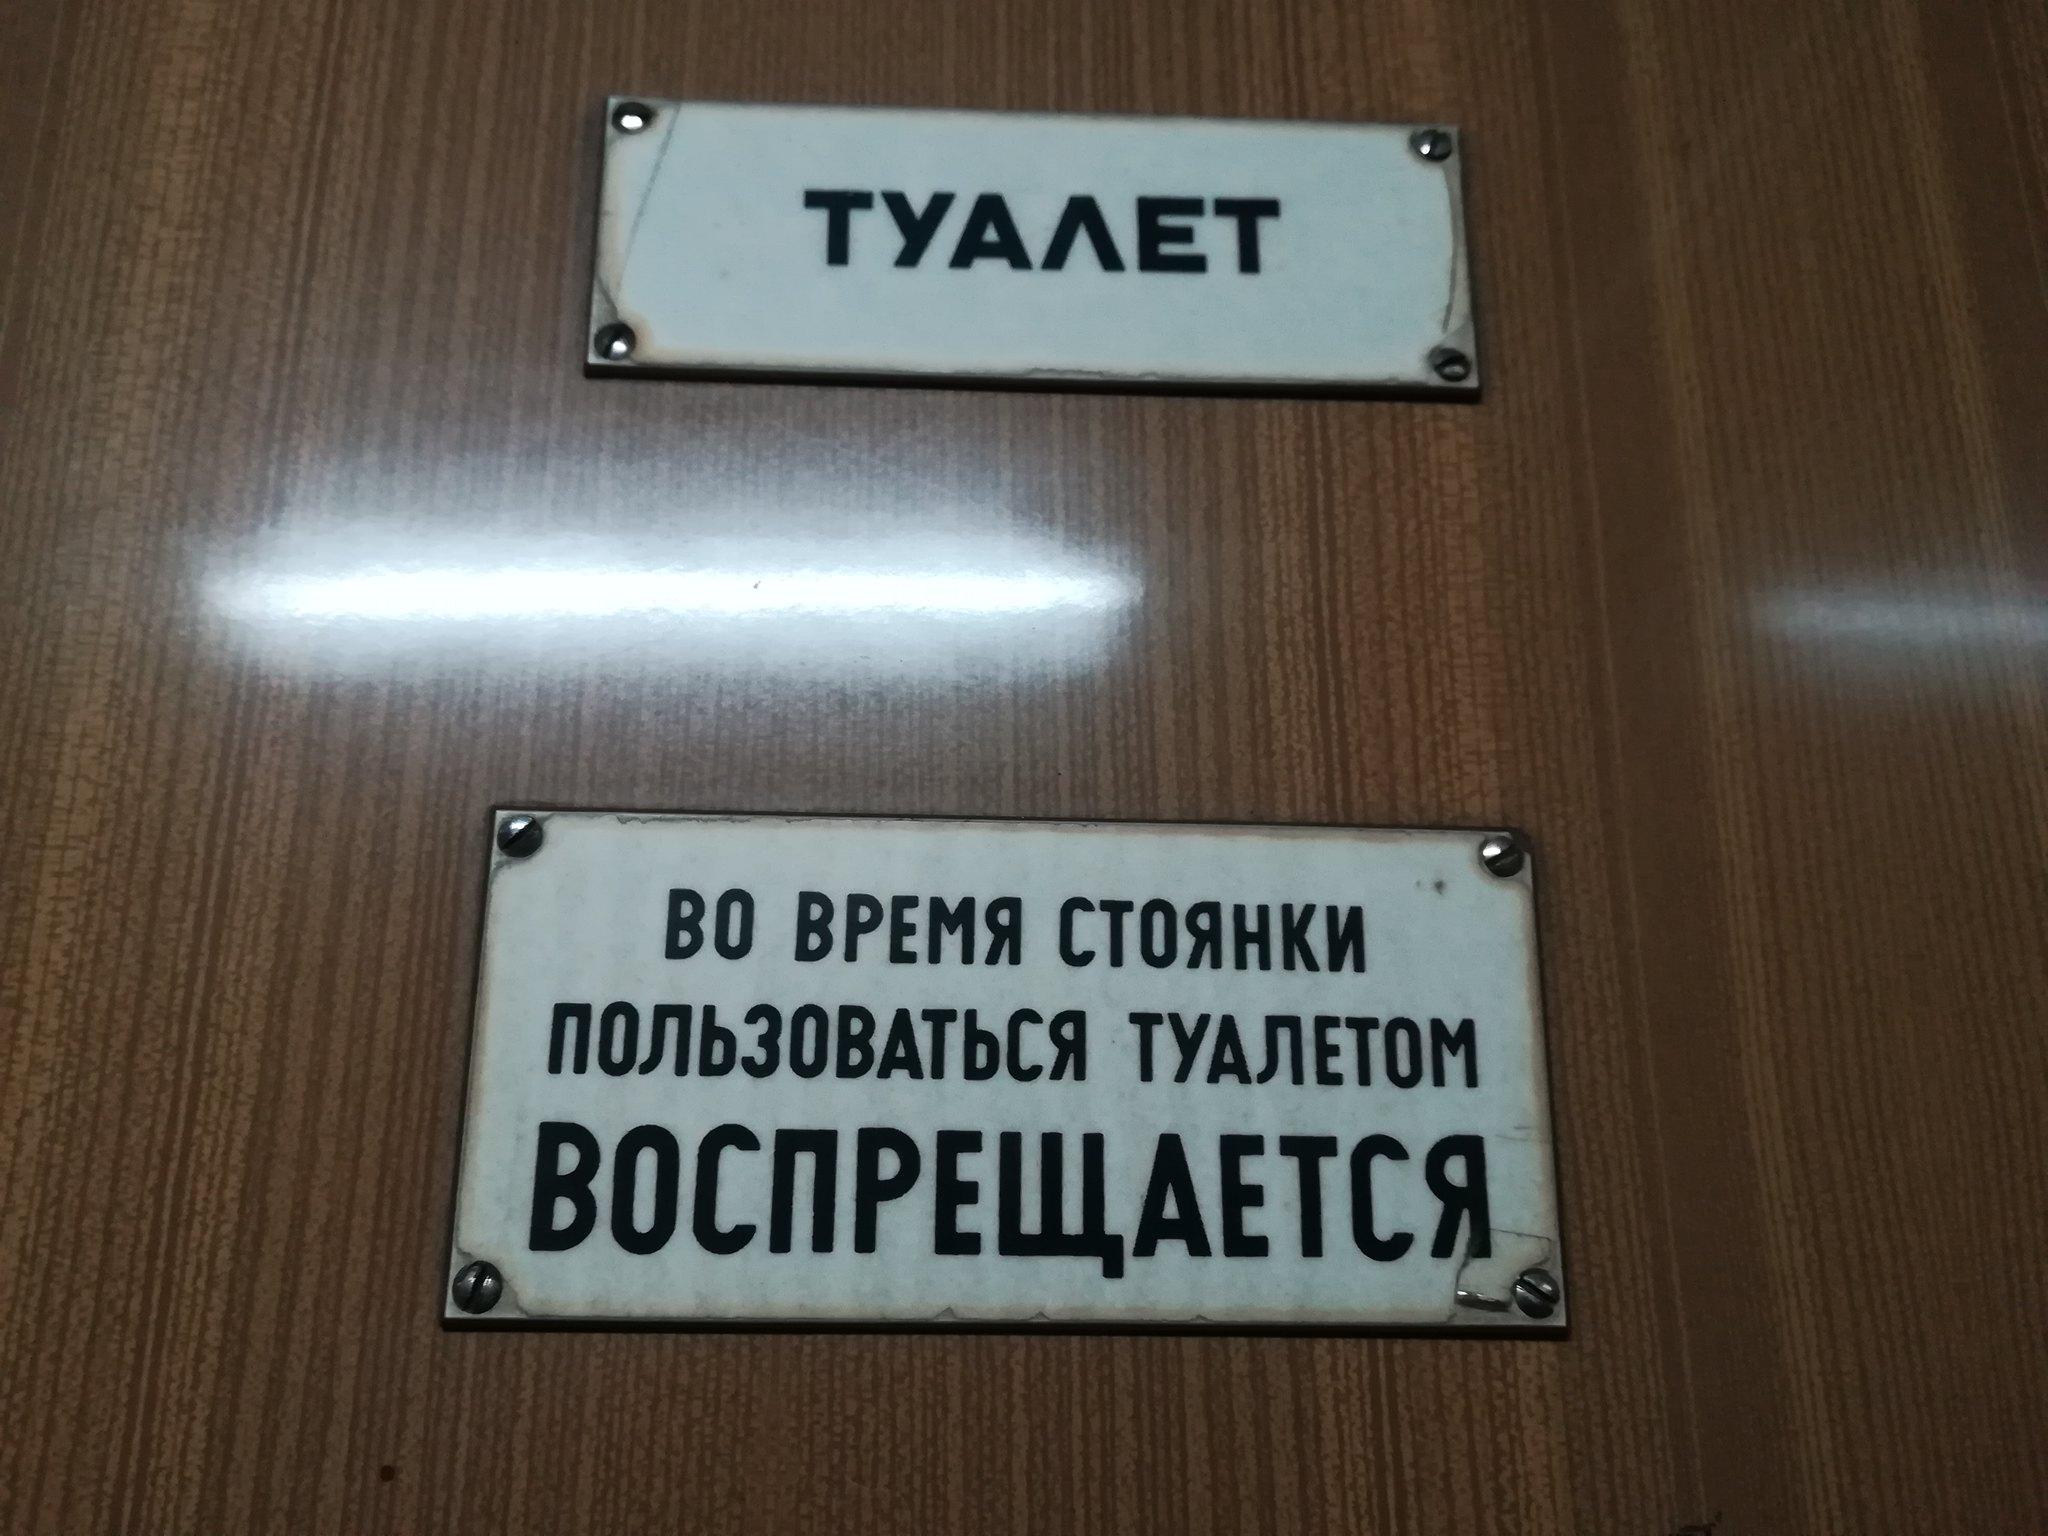 Reportaje feroviare Adirmvl - Pagina 15 44808593162_0b17511a5c_k